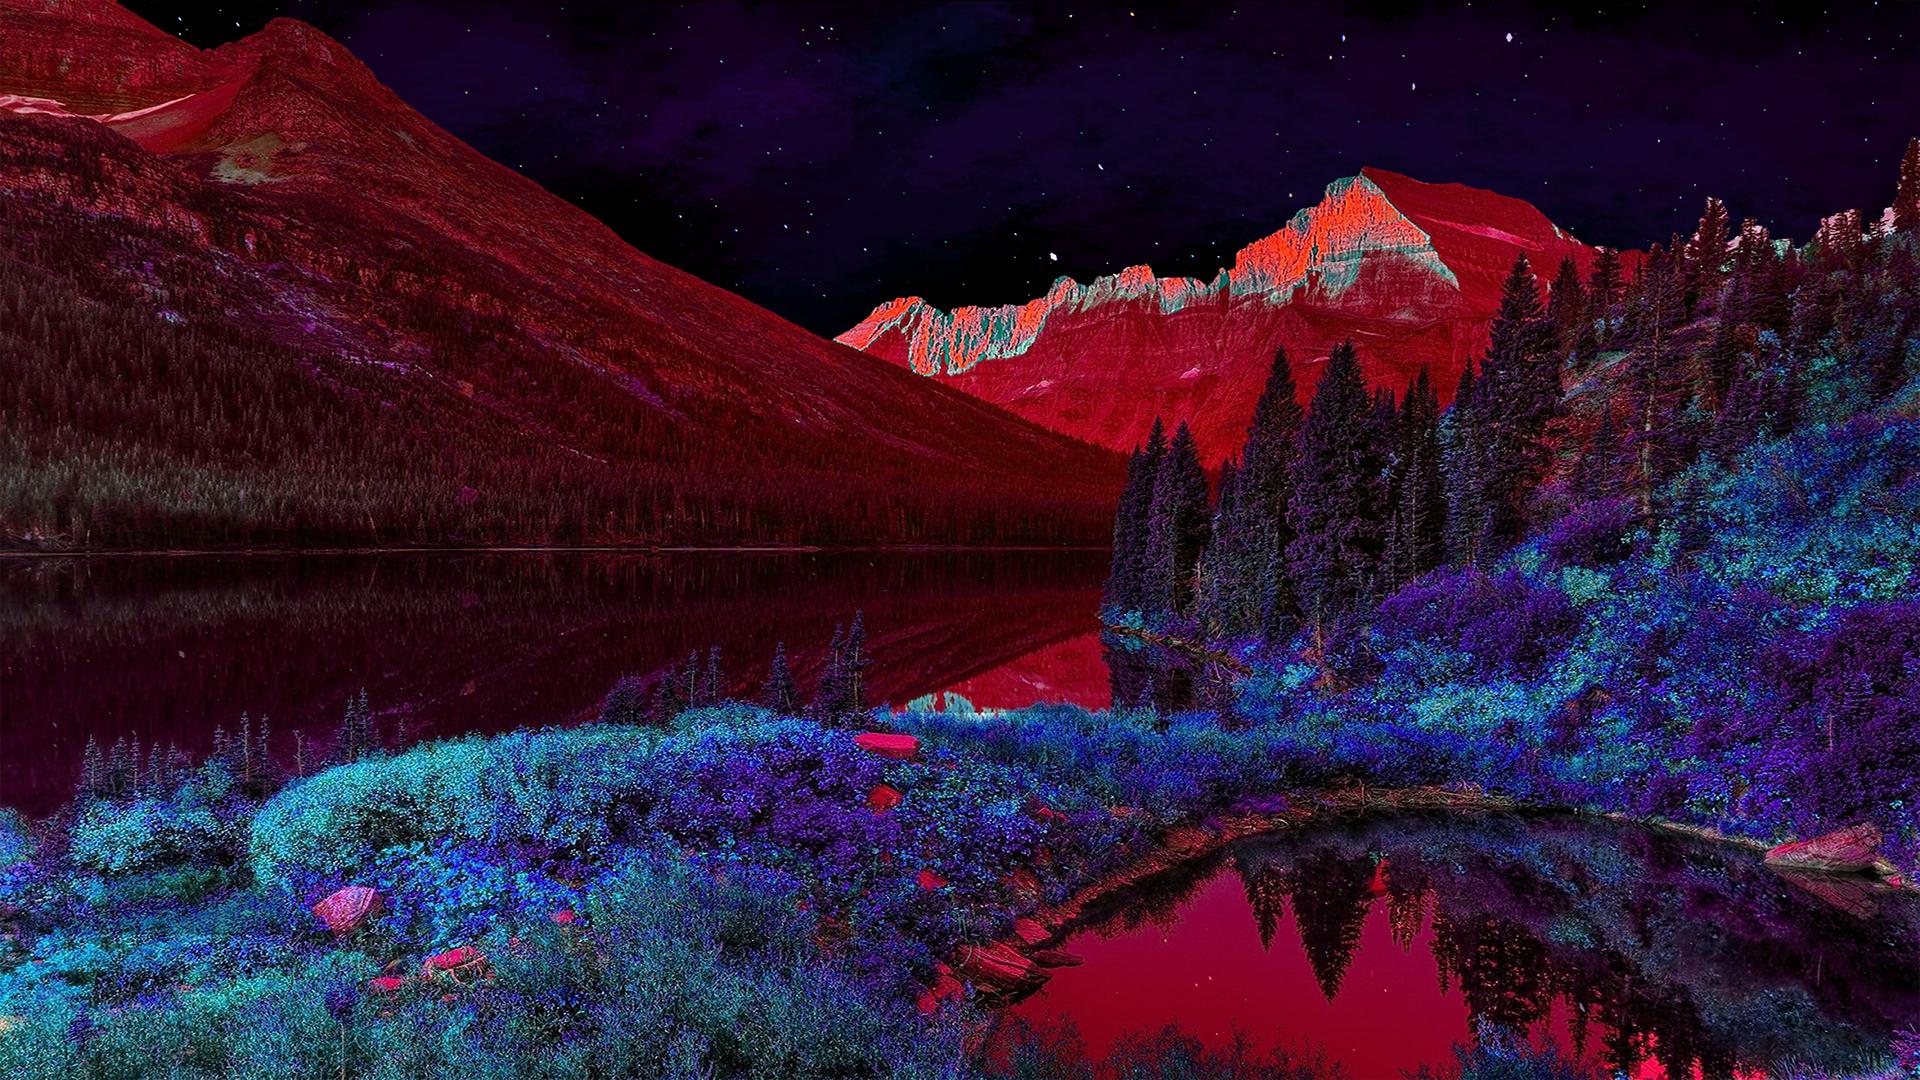 Good Wallpaper Mountain Trippy - 454ae82f736606dac9bd8591017f7942  Photograph_932773.png